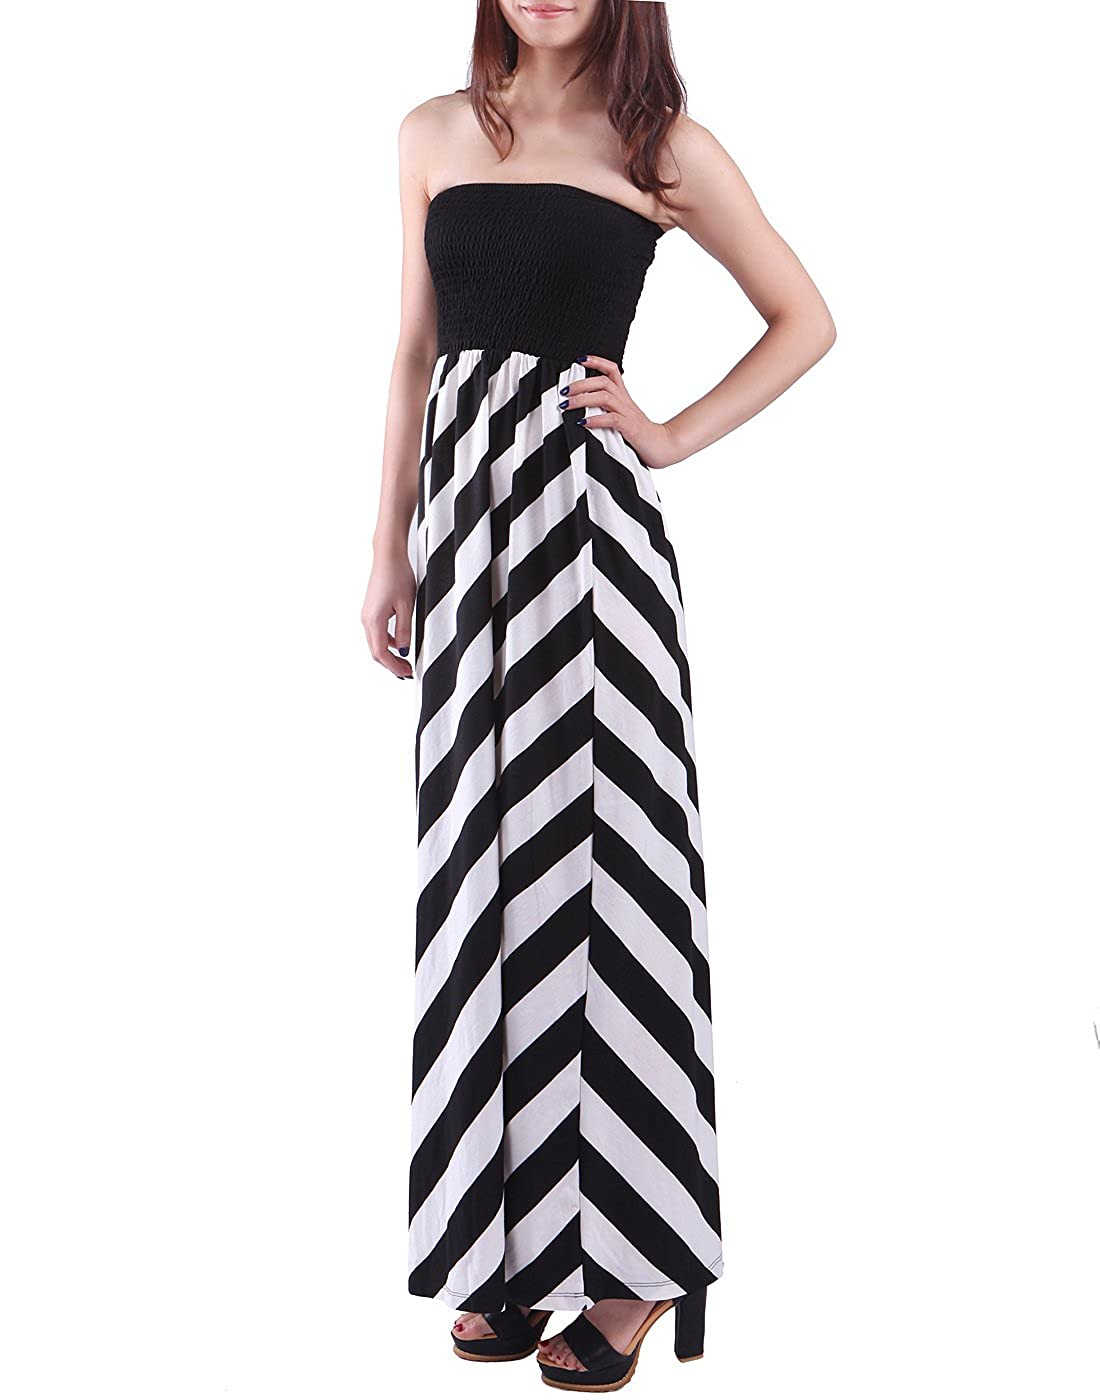 eff2bd1a789 HDE Women s Maternity Dress Strapless Tube Top Pregnancy Sundress Long Skirt  at Amazon Women s Clothing store